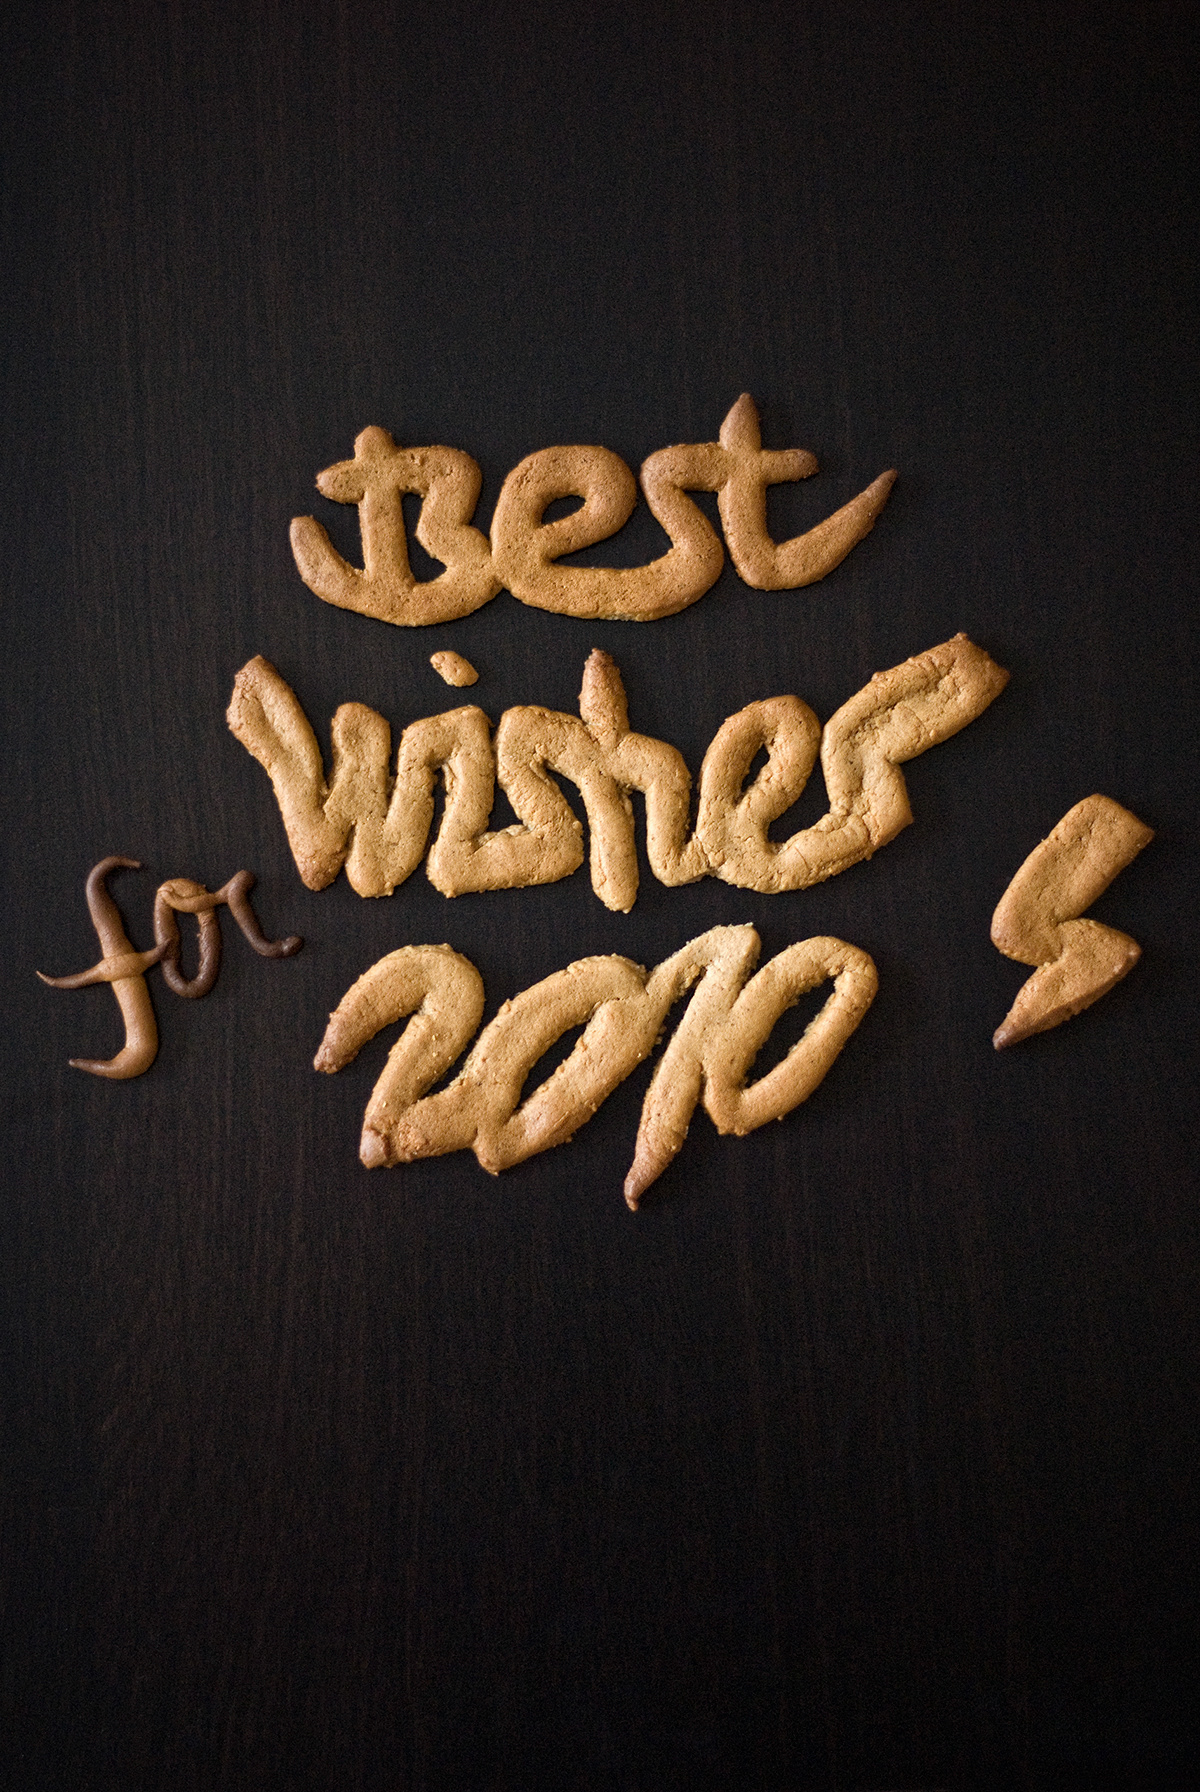 TYPOS typography   lettrage cookies Food  cake pepperkake norsk norwegian French Paris oslo homemade home hand made handmade weird stenkat Bastardgraphics ease XAL Daff MONSIEUR DEEZ luvgalz 5ive Bats